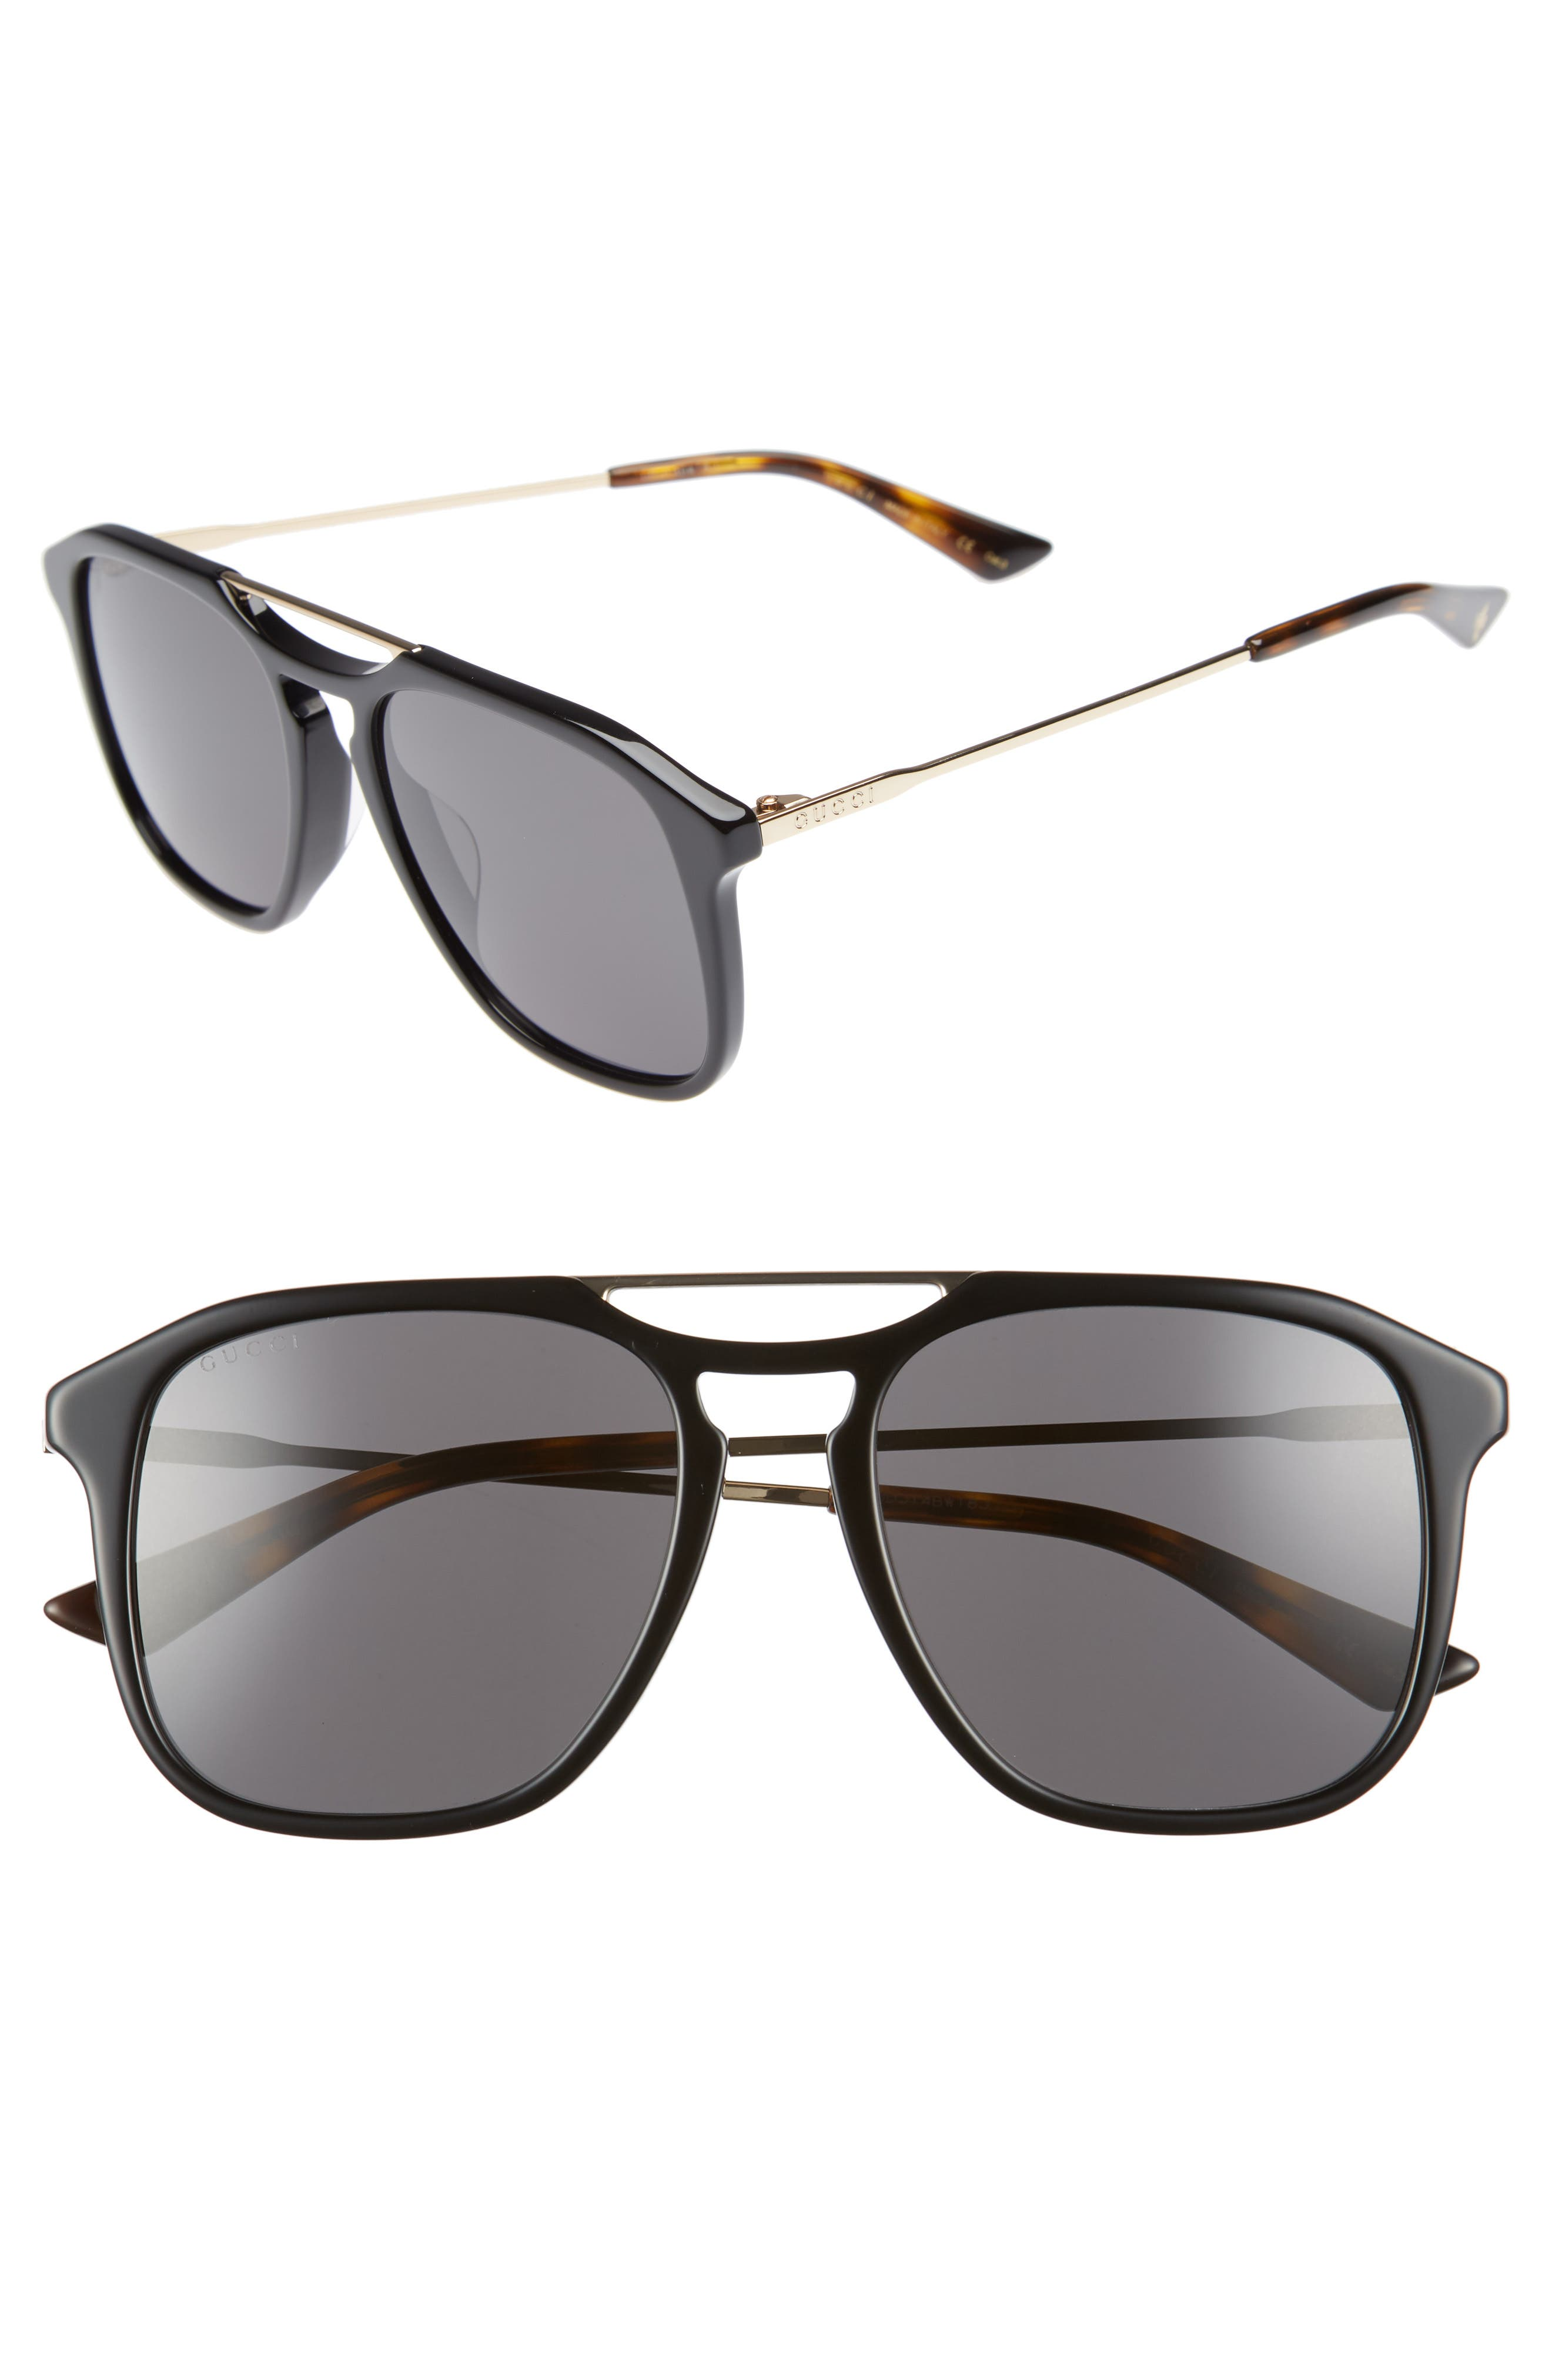 Light Combi 55mm Aviator Sunglasses,                             Main thumbnail 1, color,                             Gold/ Dark Havana